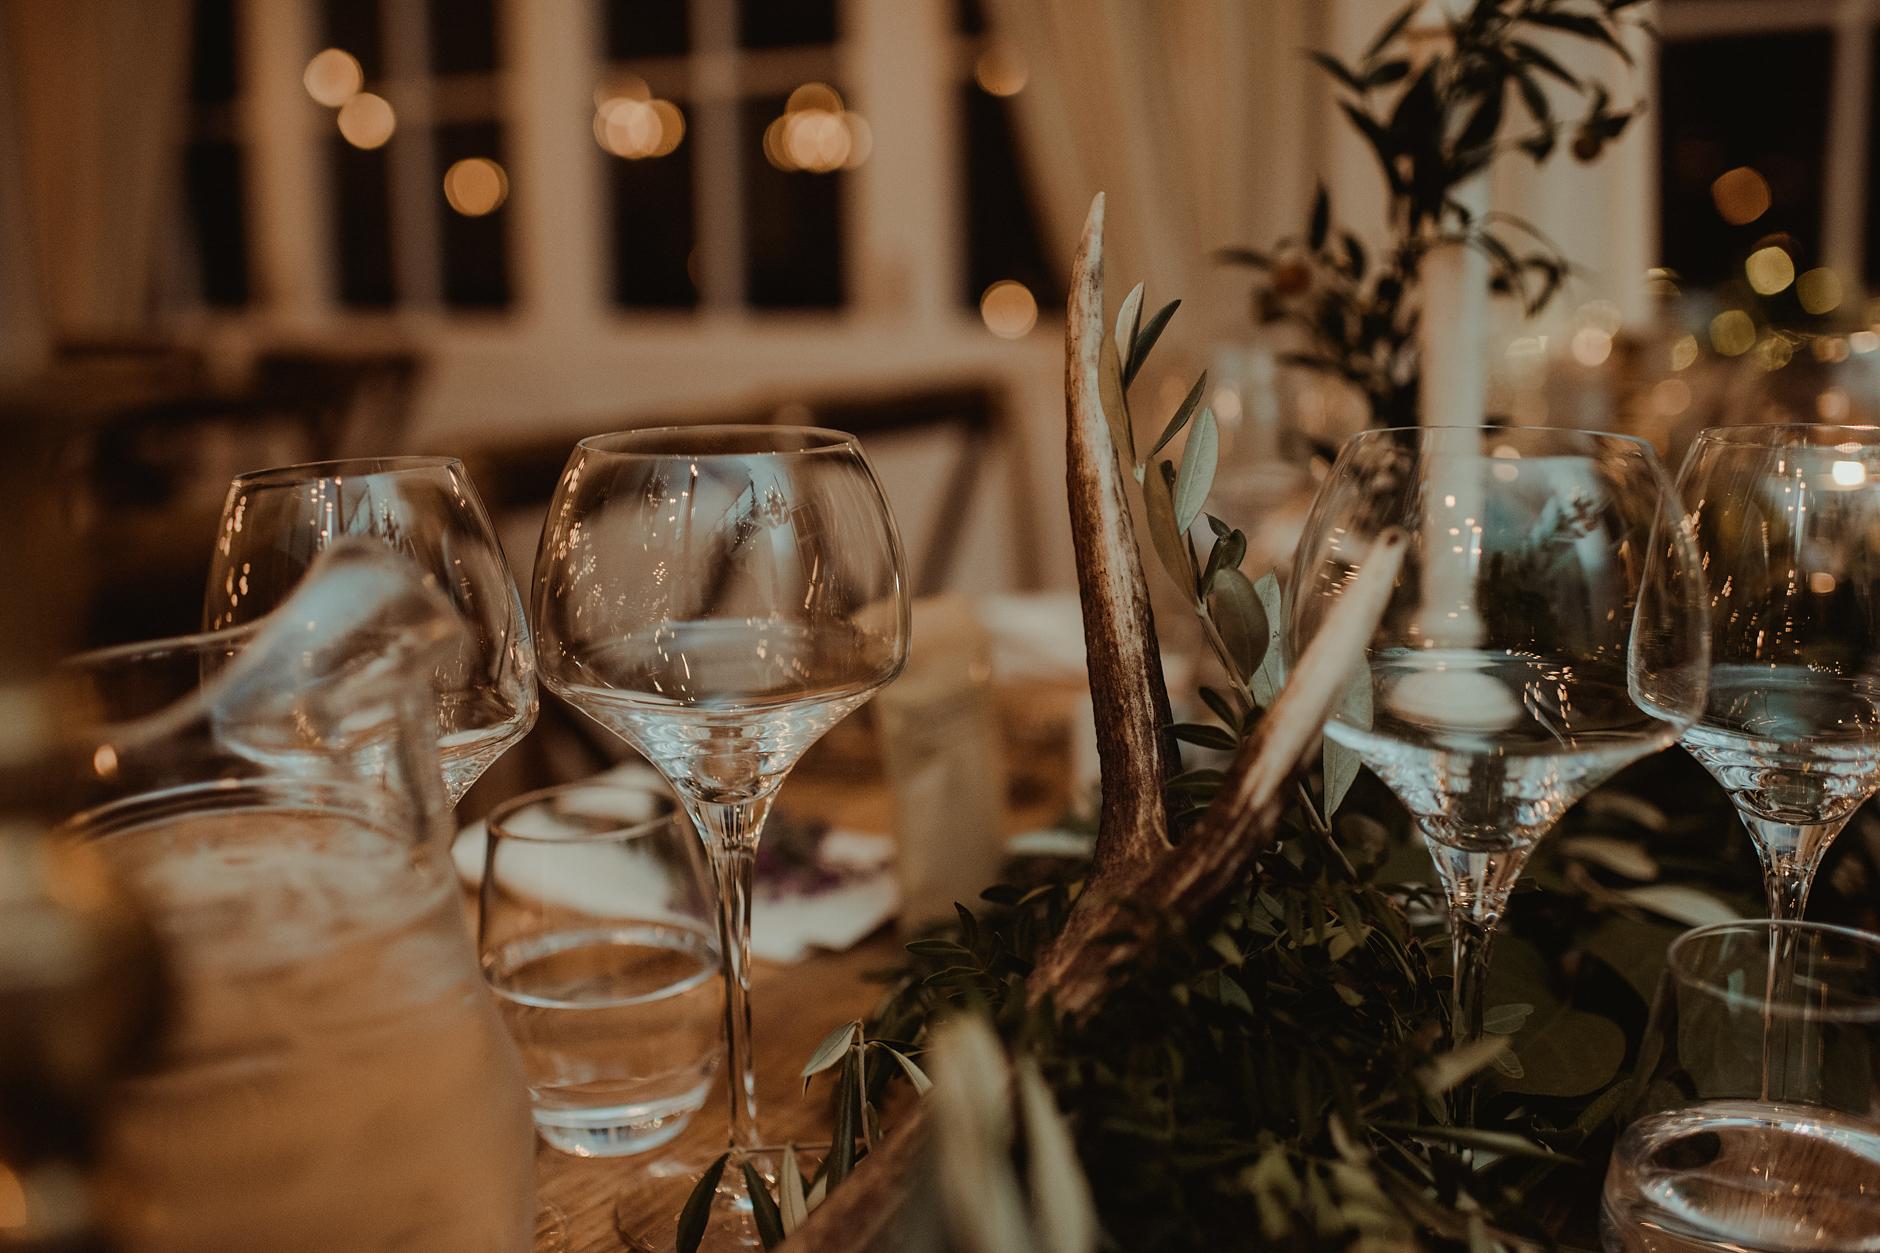 Glentruim-Wedding-Nikki-Leadbetter-Photography-245.jpg